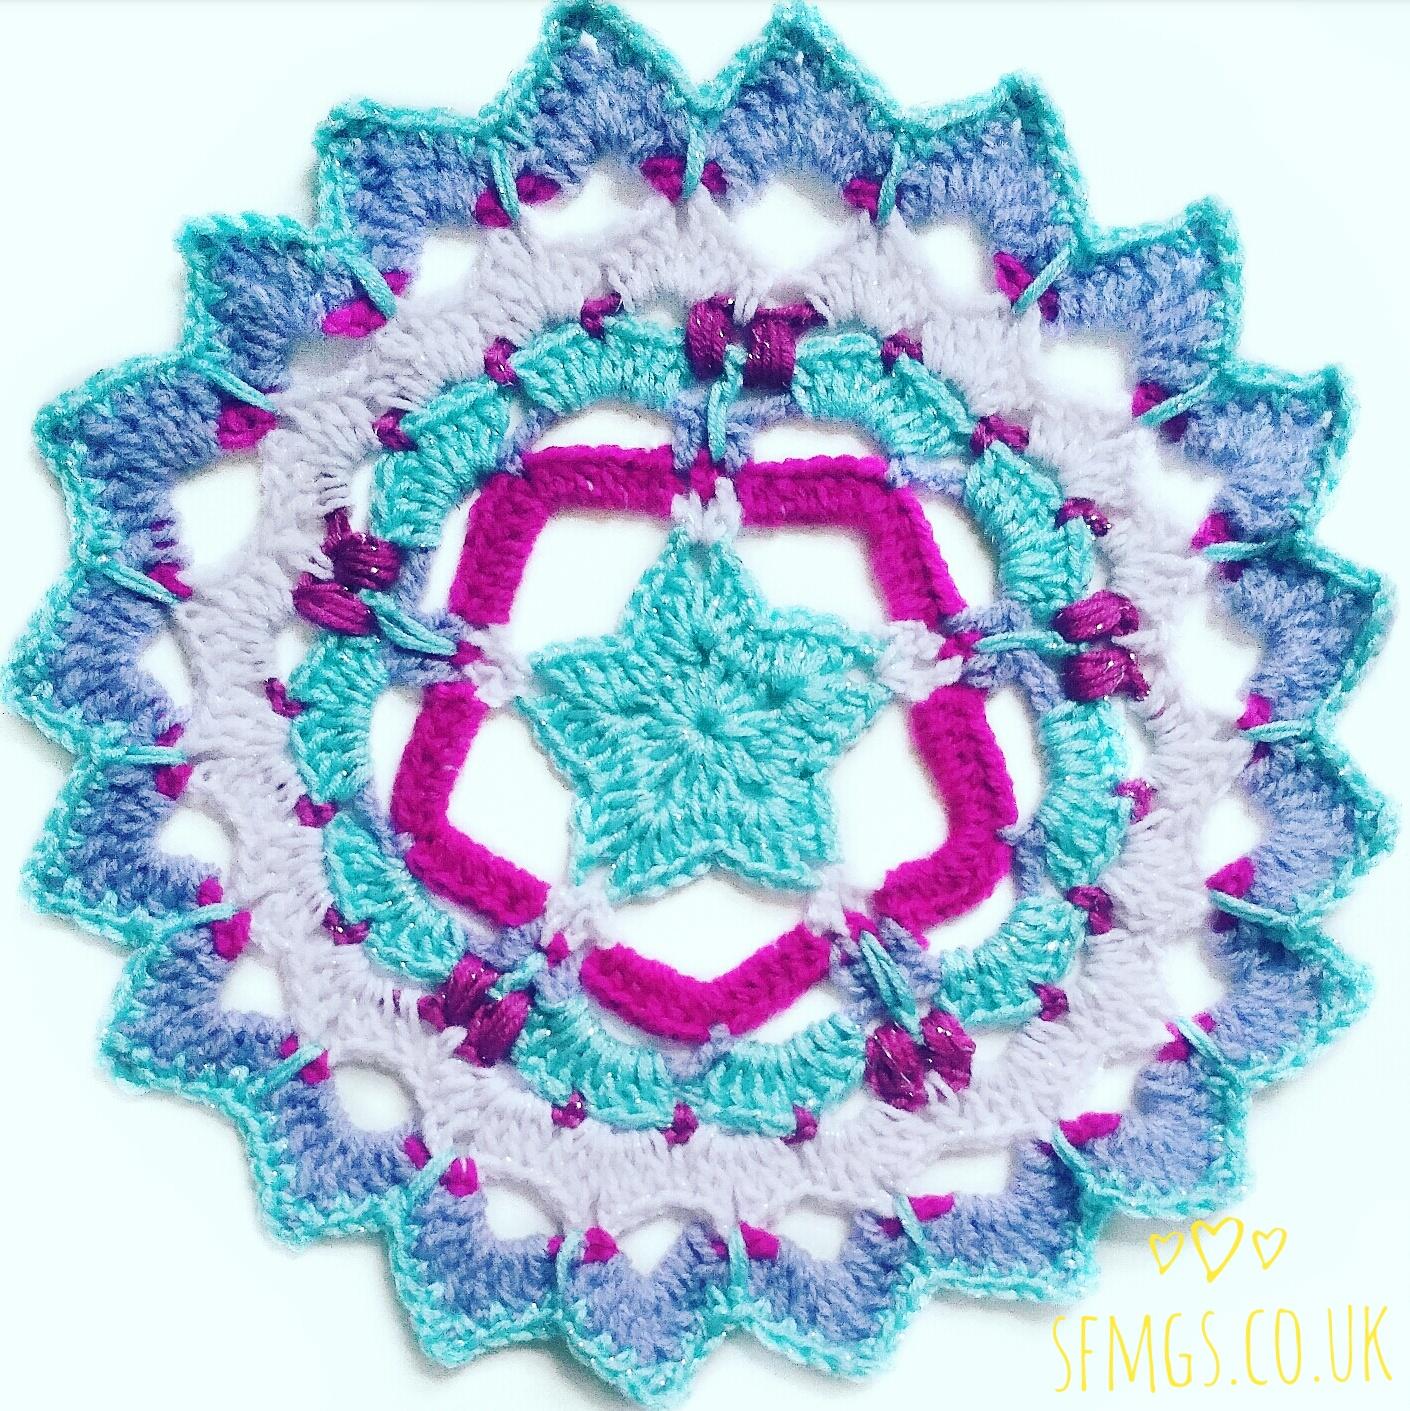 set free my gypsy soul a crochet craft blog festive sparkle star mandala free crochet pattern. Black Bedroom Furniture Sets. Home Design Ideas